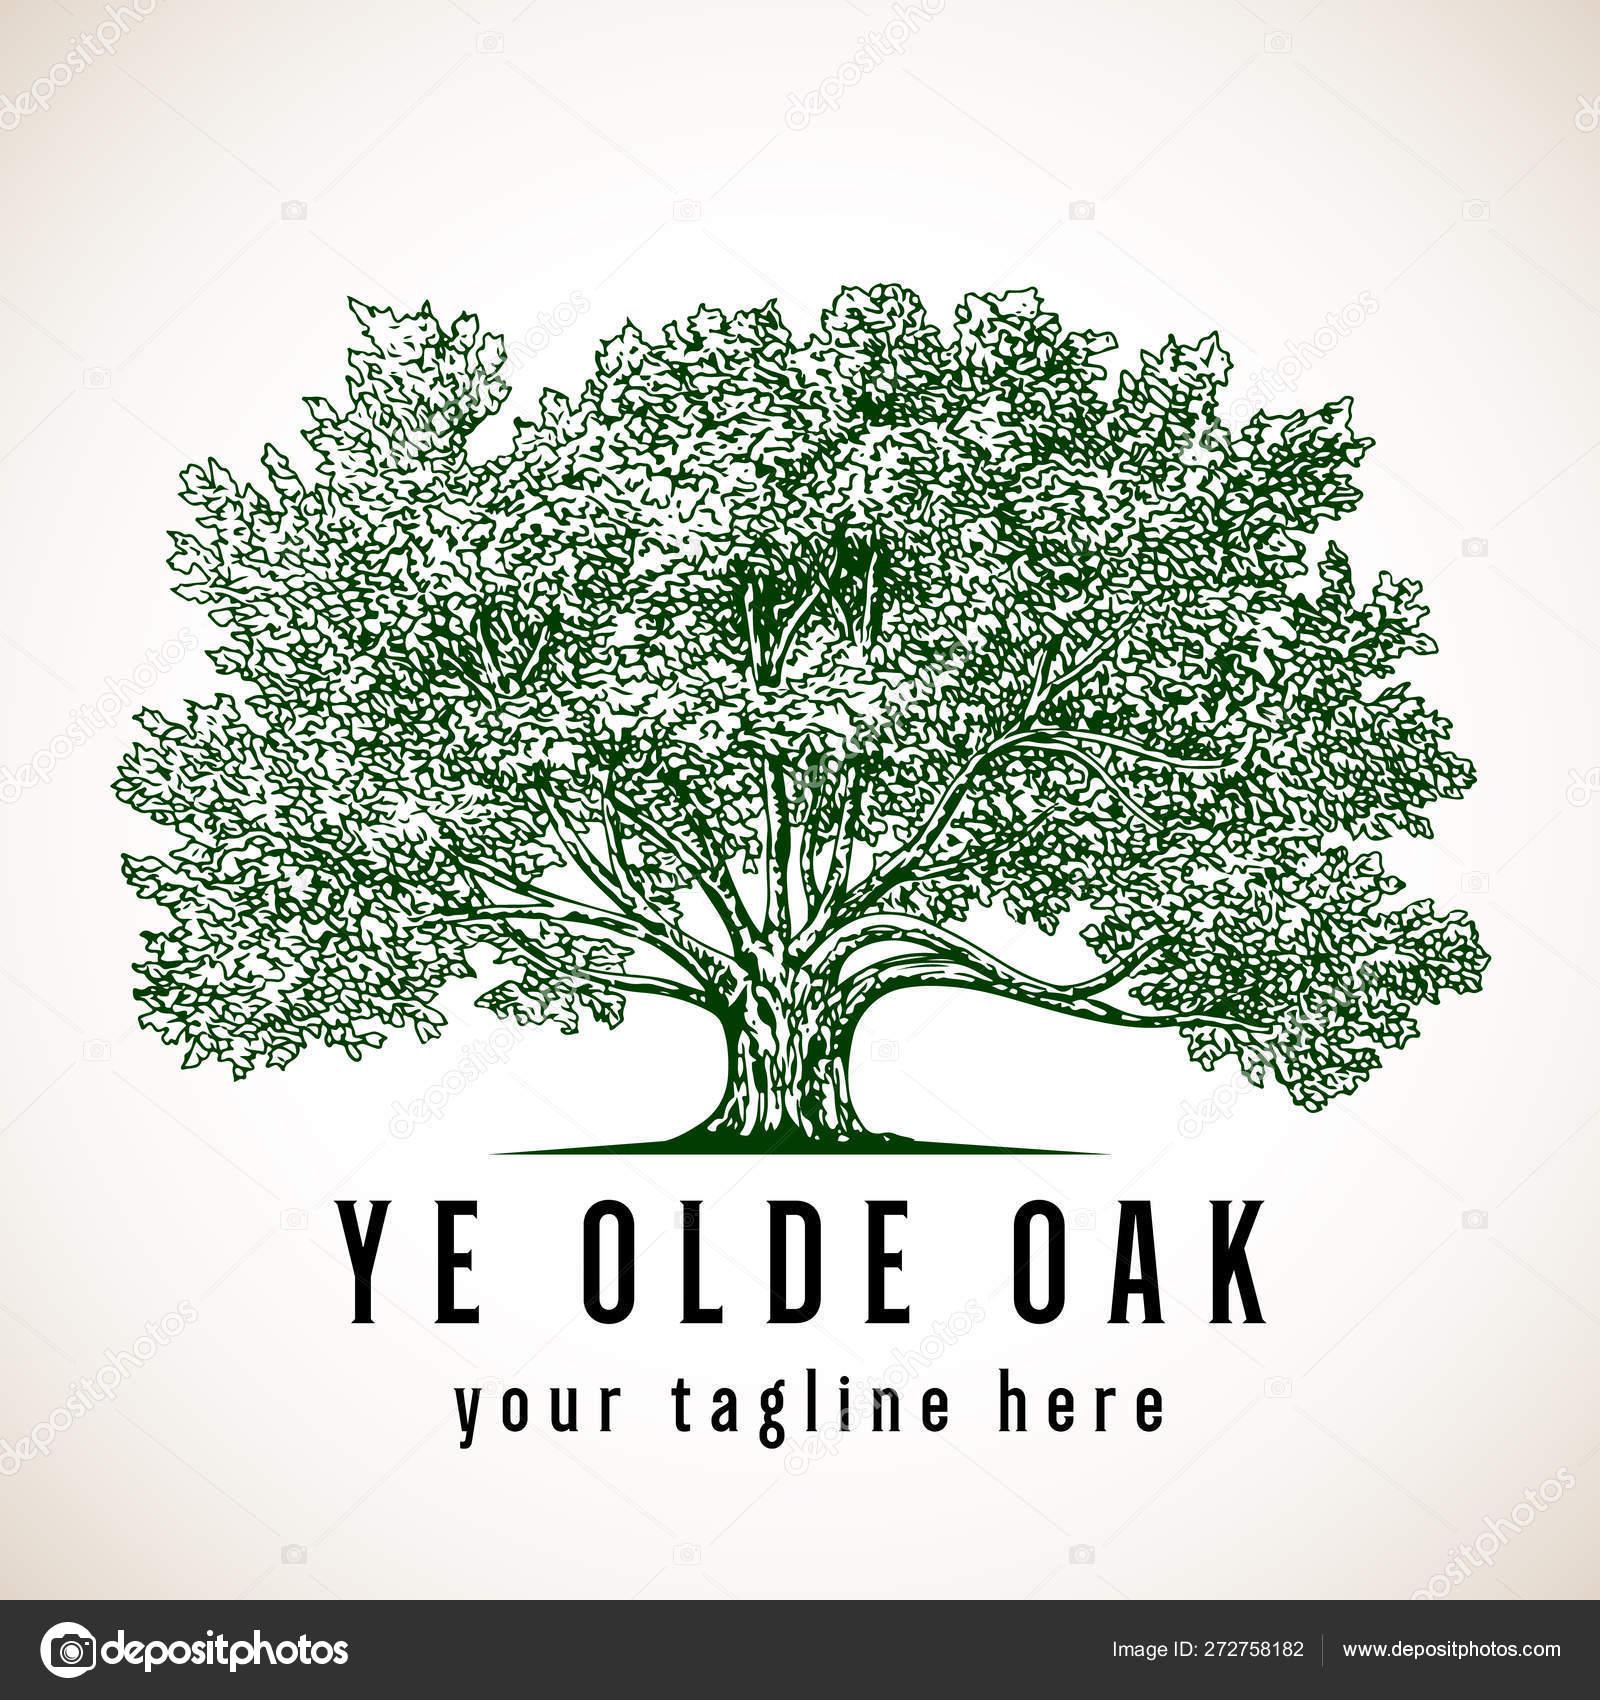 Tree Logo Vintage Style Illustration Oak Tree Vector Image By C Giraphics Vector Stock 272758182